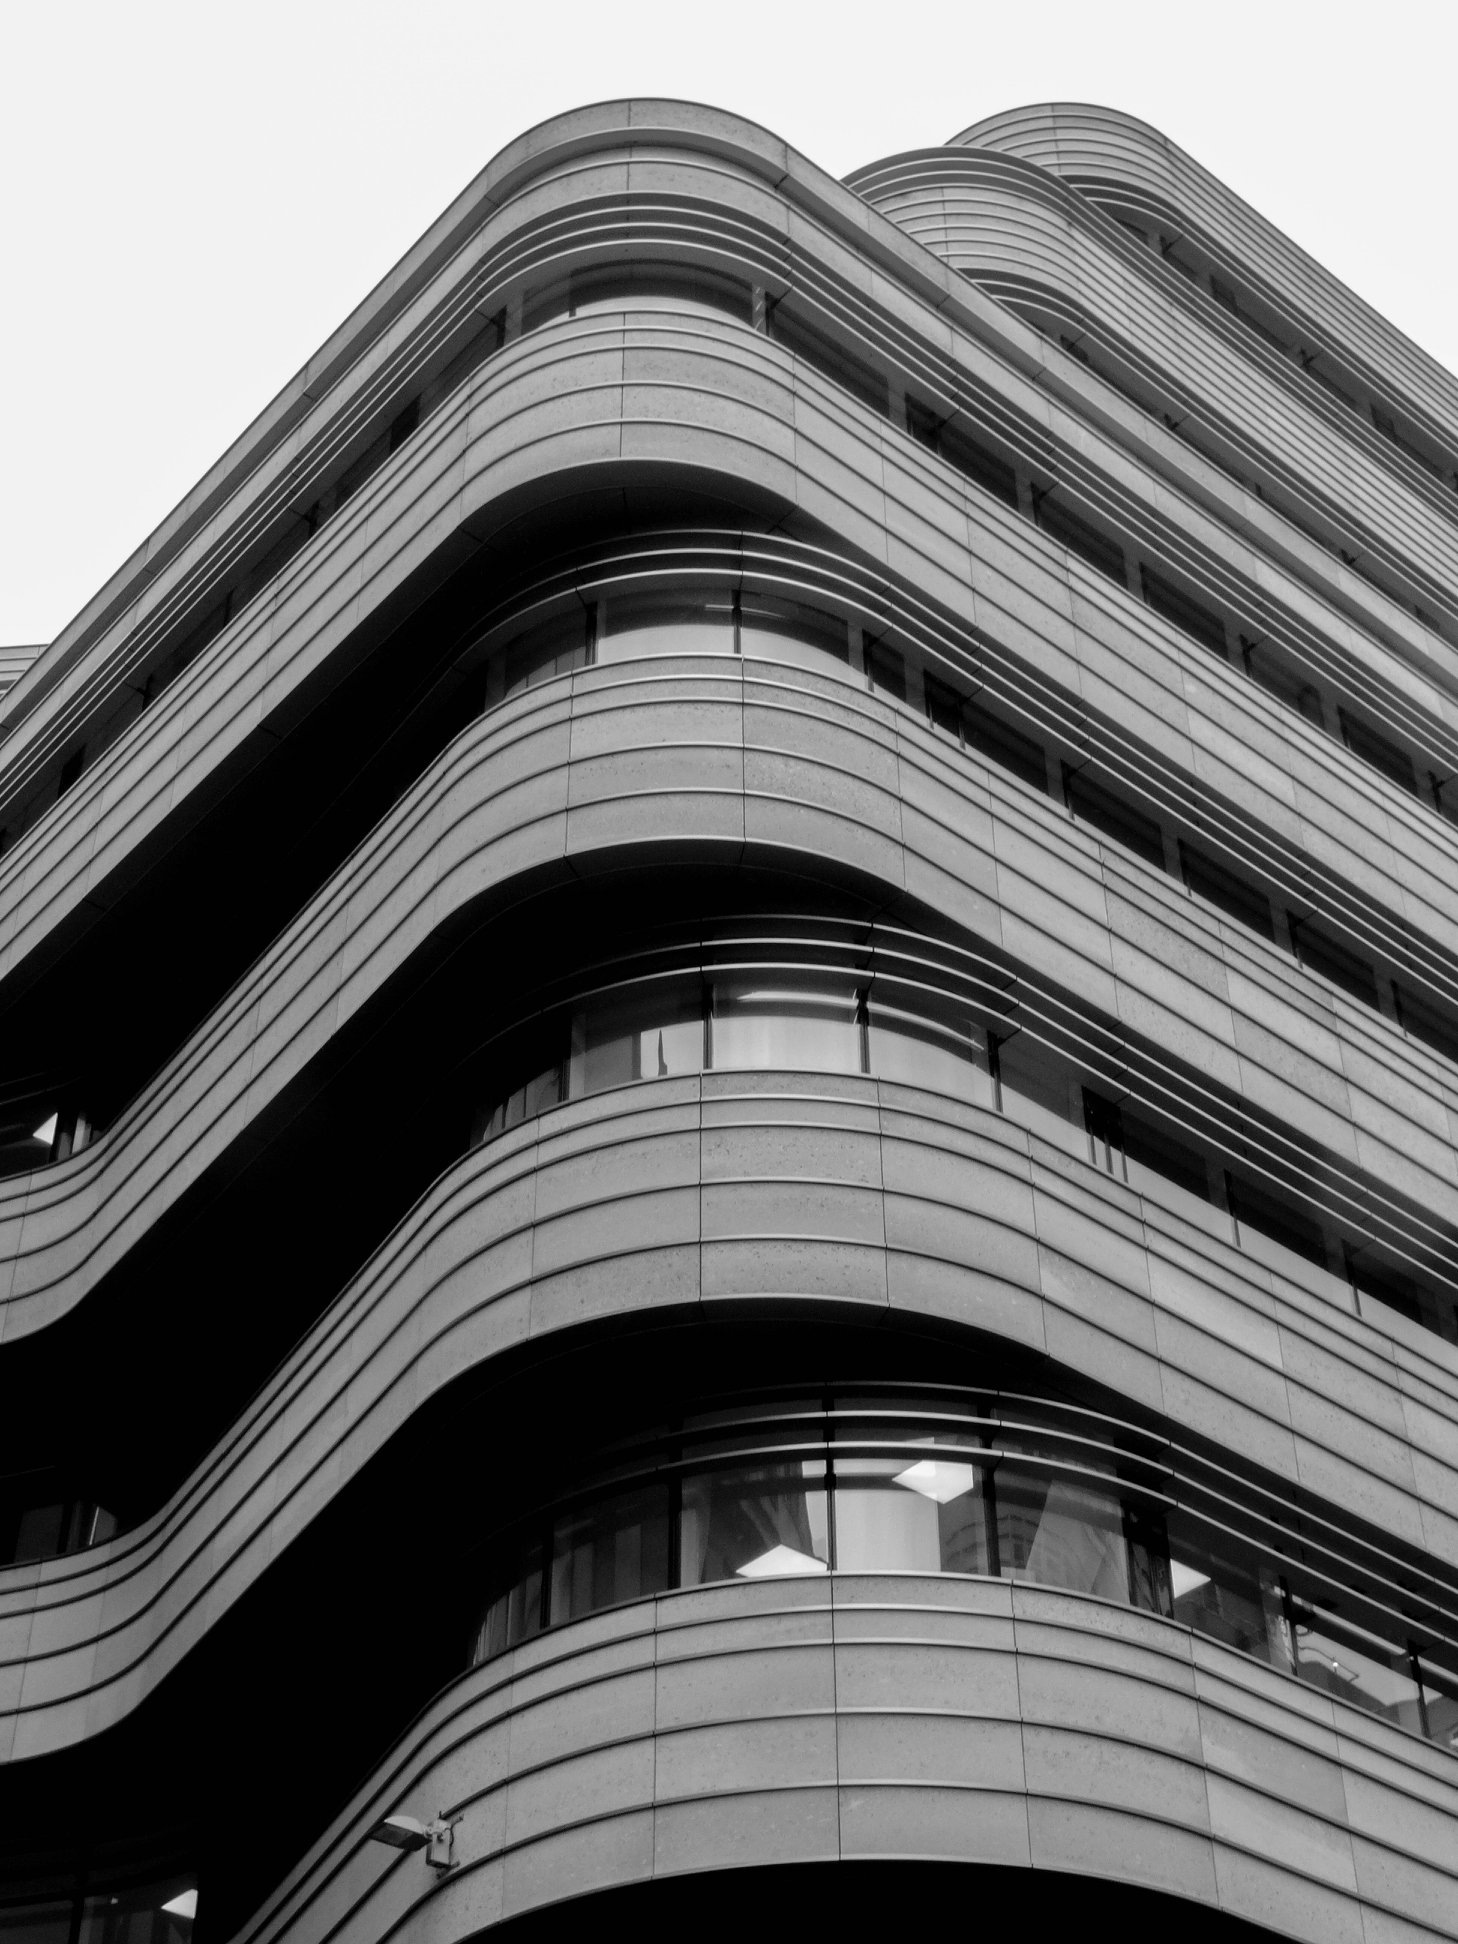 london, architecture, blackandwhite - jennilatham | ello